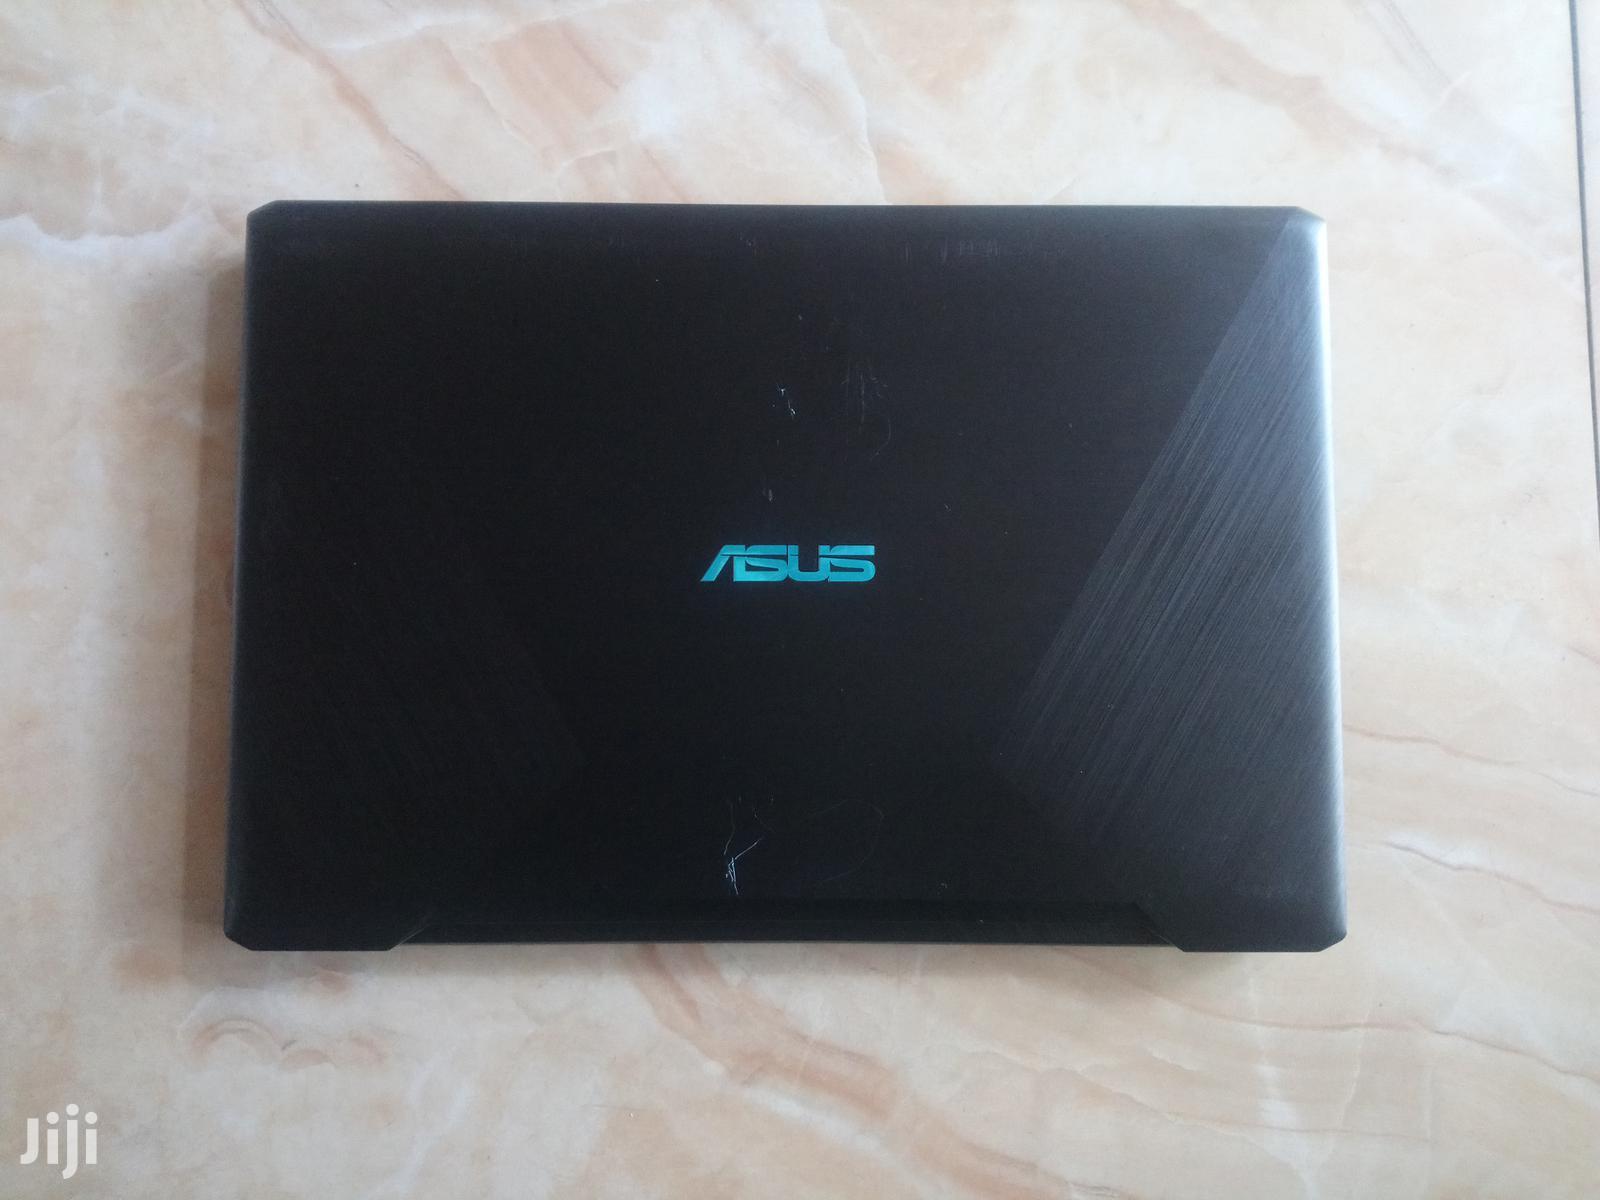 Archive: Laptop Asus 8GB Intel Core i7 SSHD (Hybrid) 1T